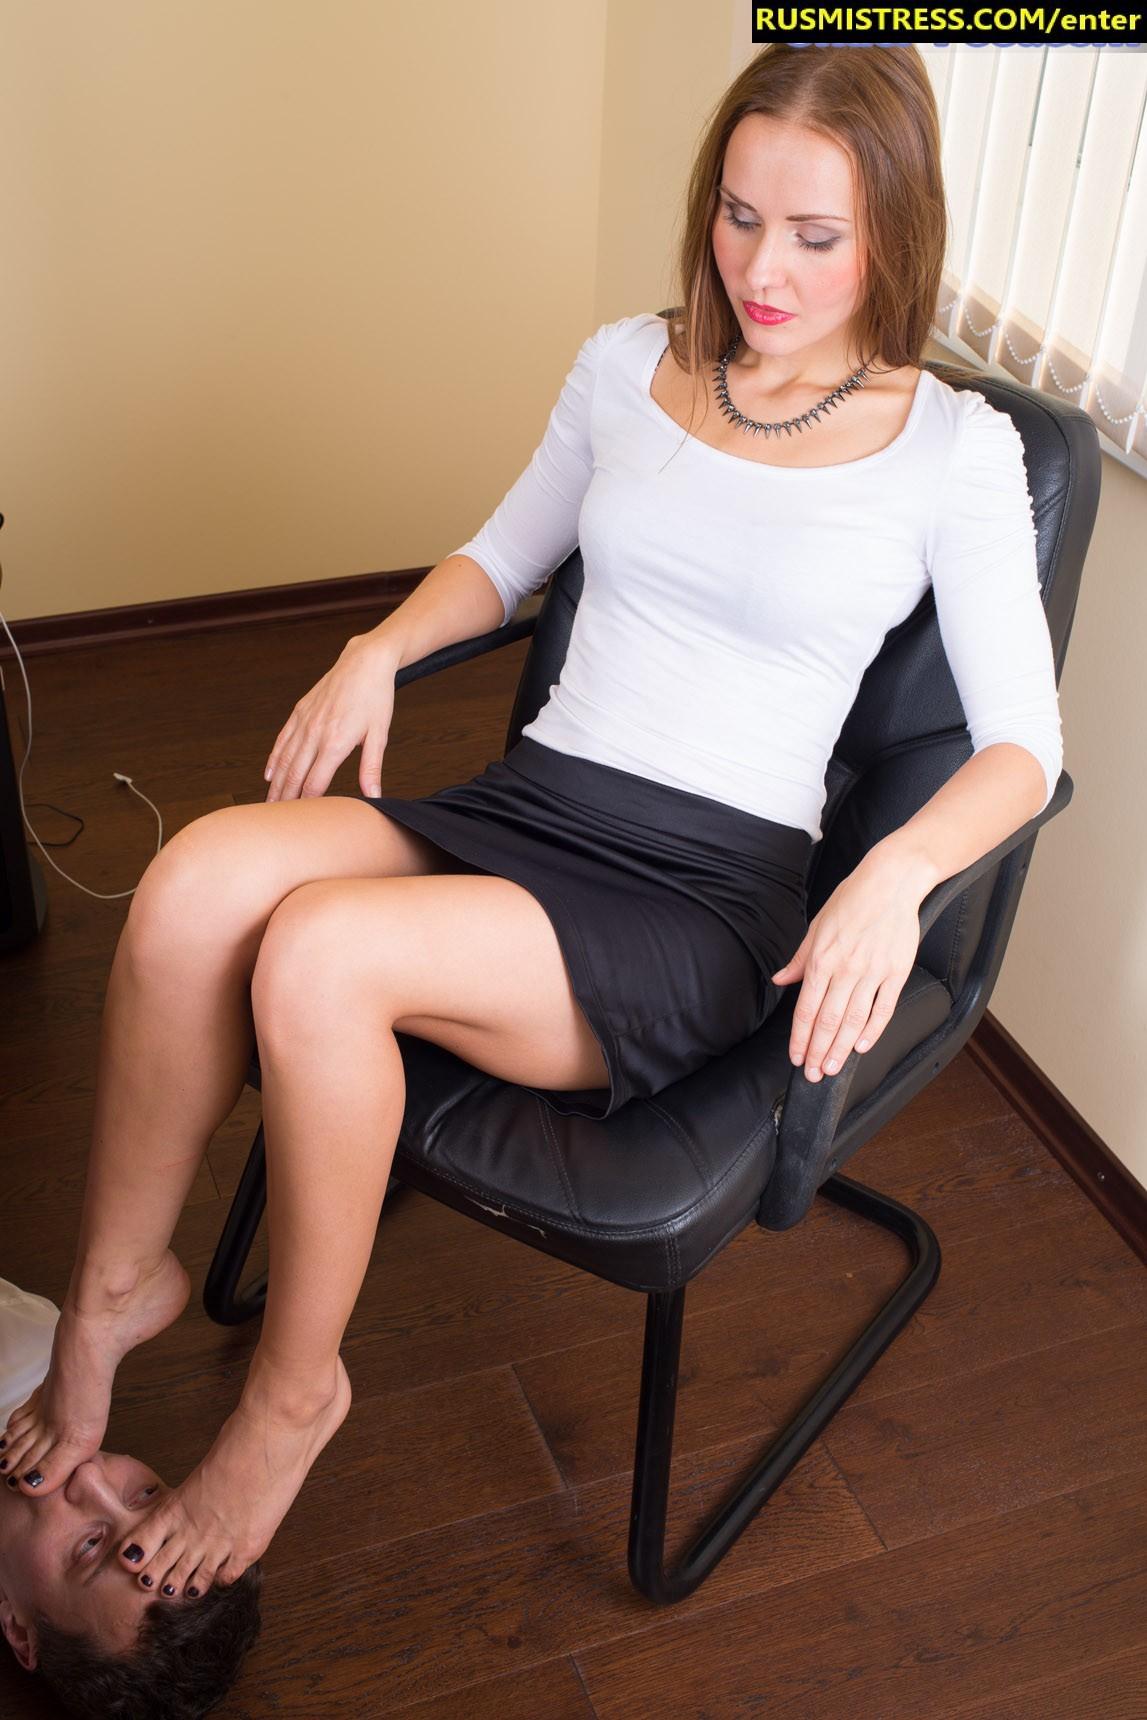 Seldom.. beautiful girlfriend blowjob big cock tease on cam much the